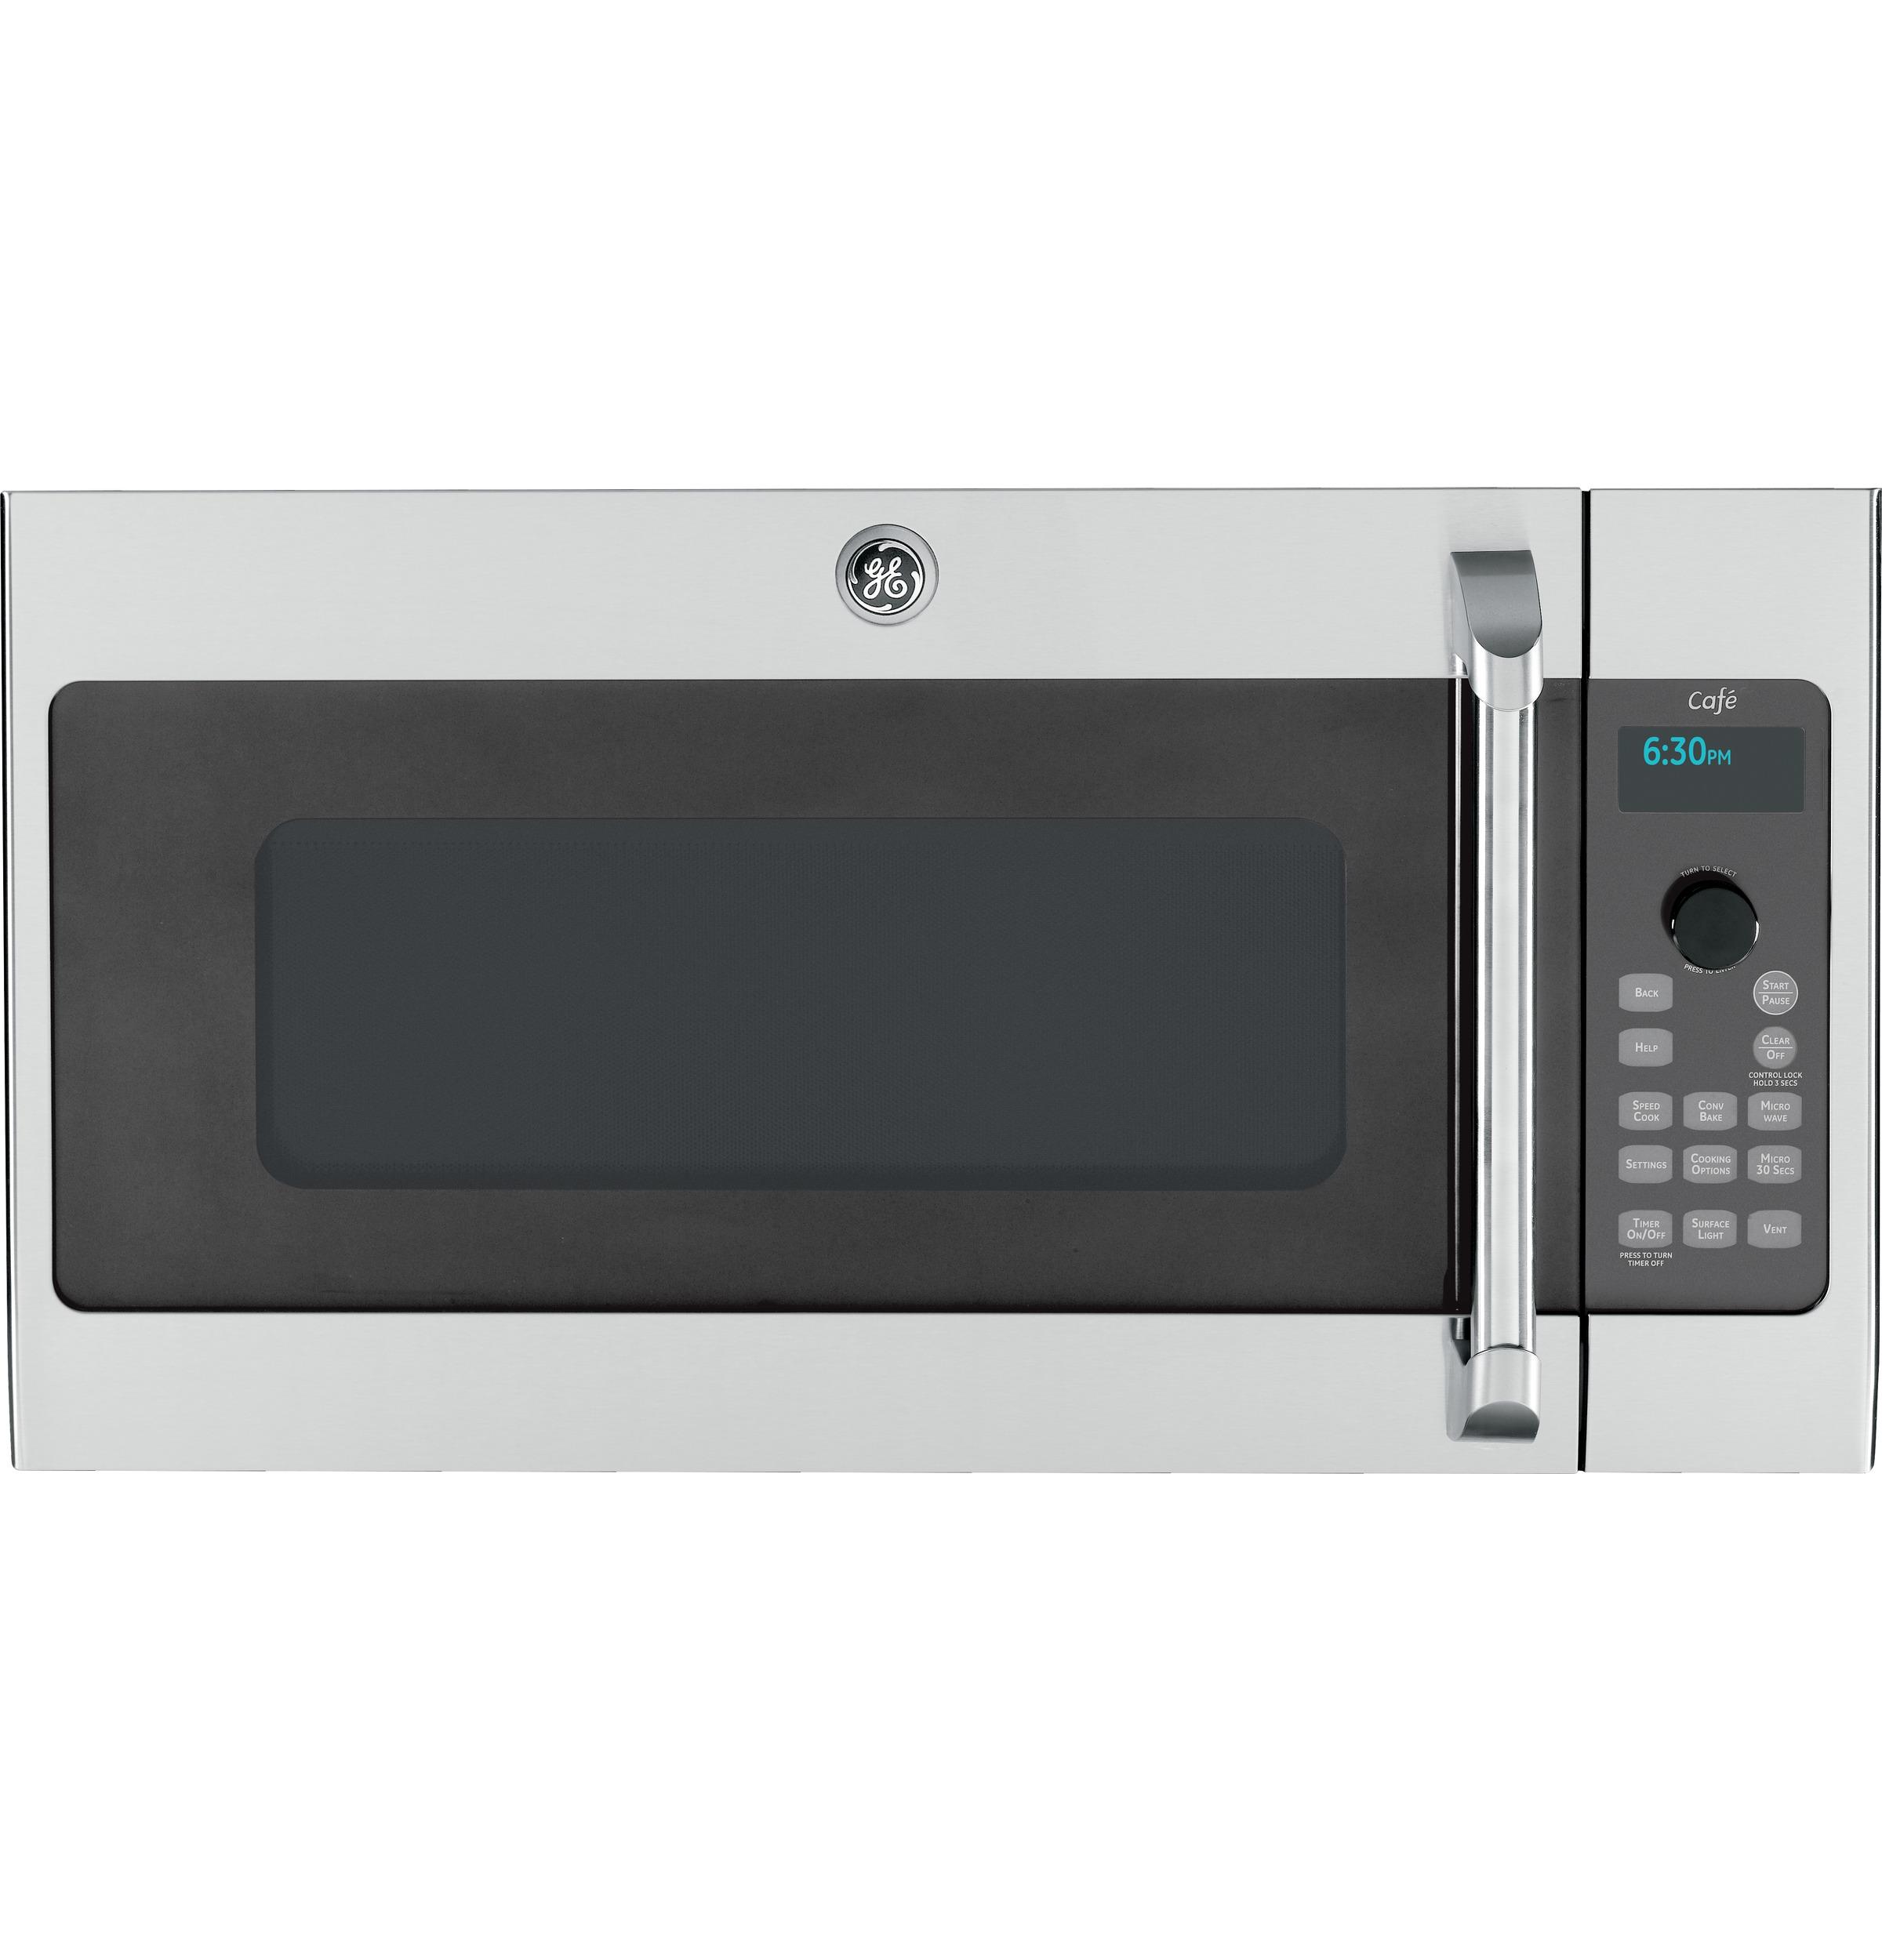 GE Café™ Series Over-the-Range Oven with Advantium® Technology